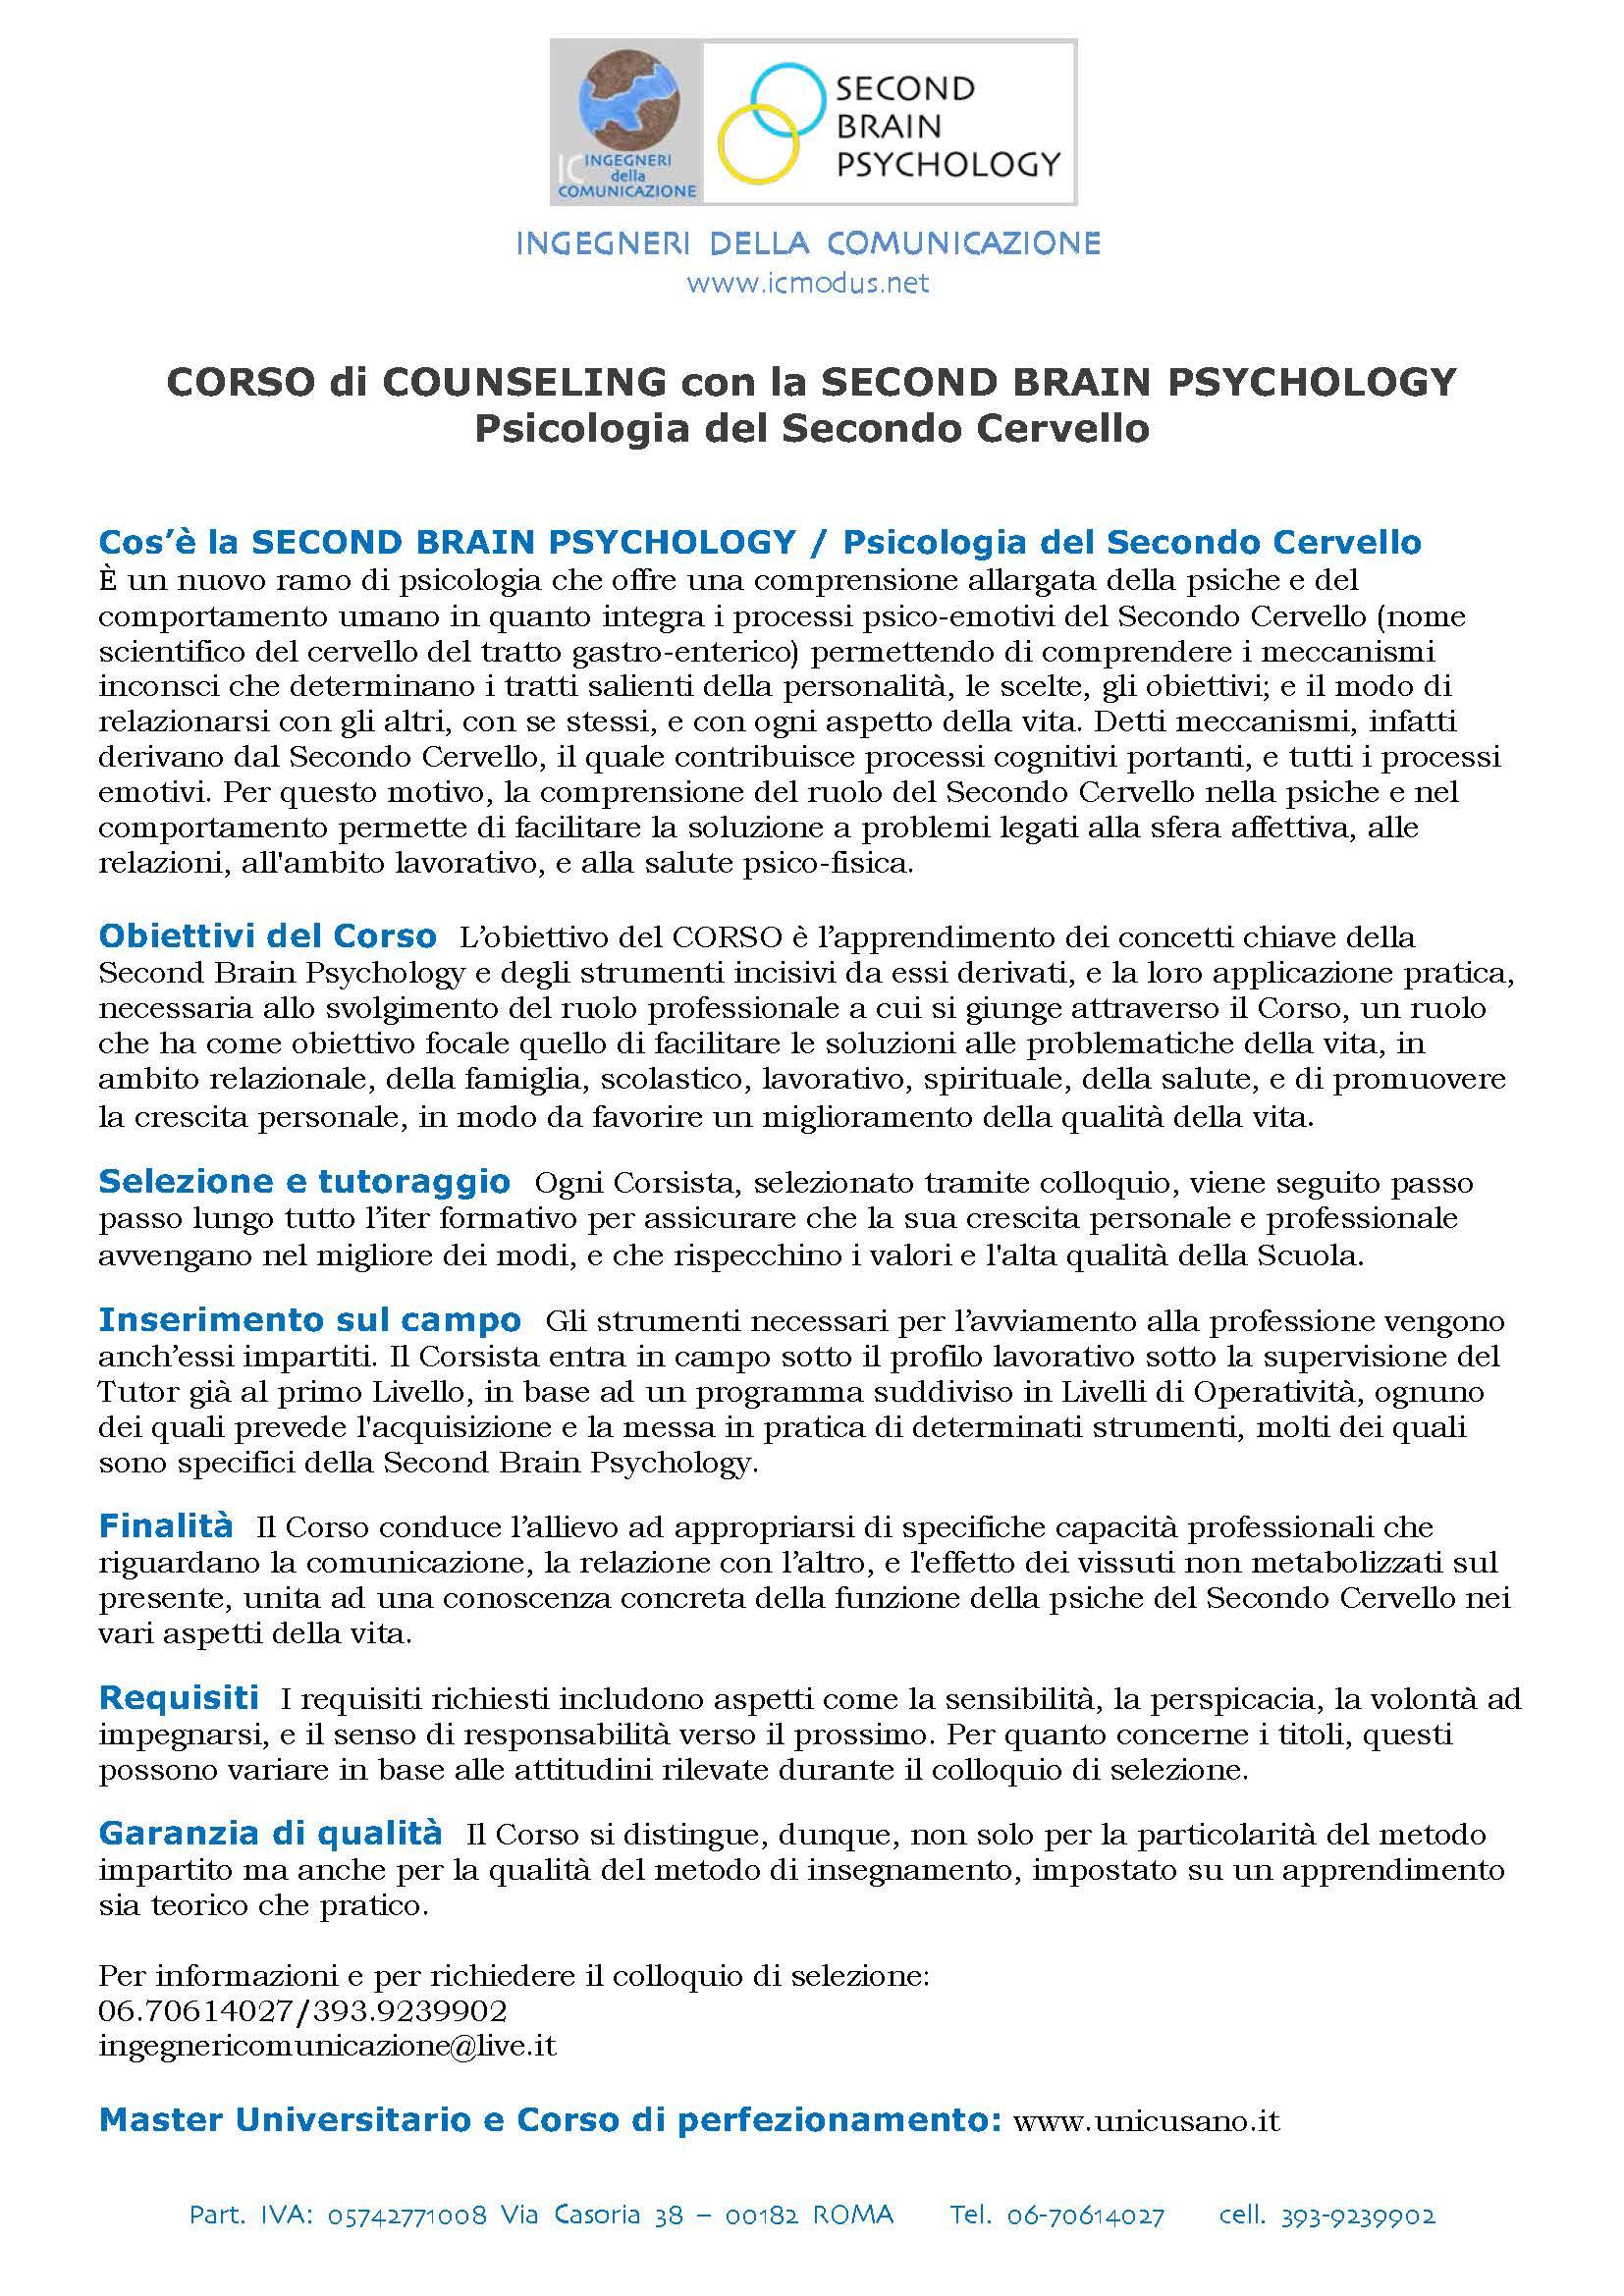 corso-counseling-sbp_ic-2017_gen